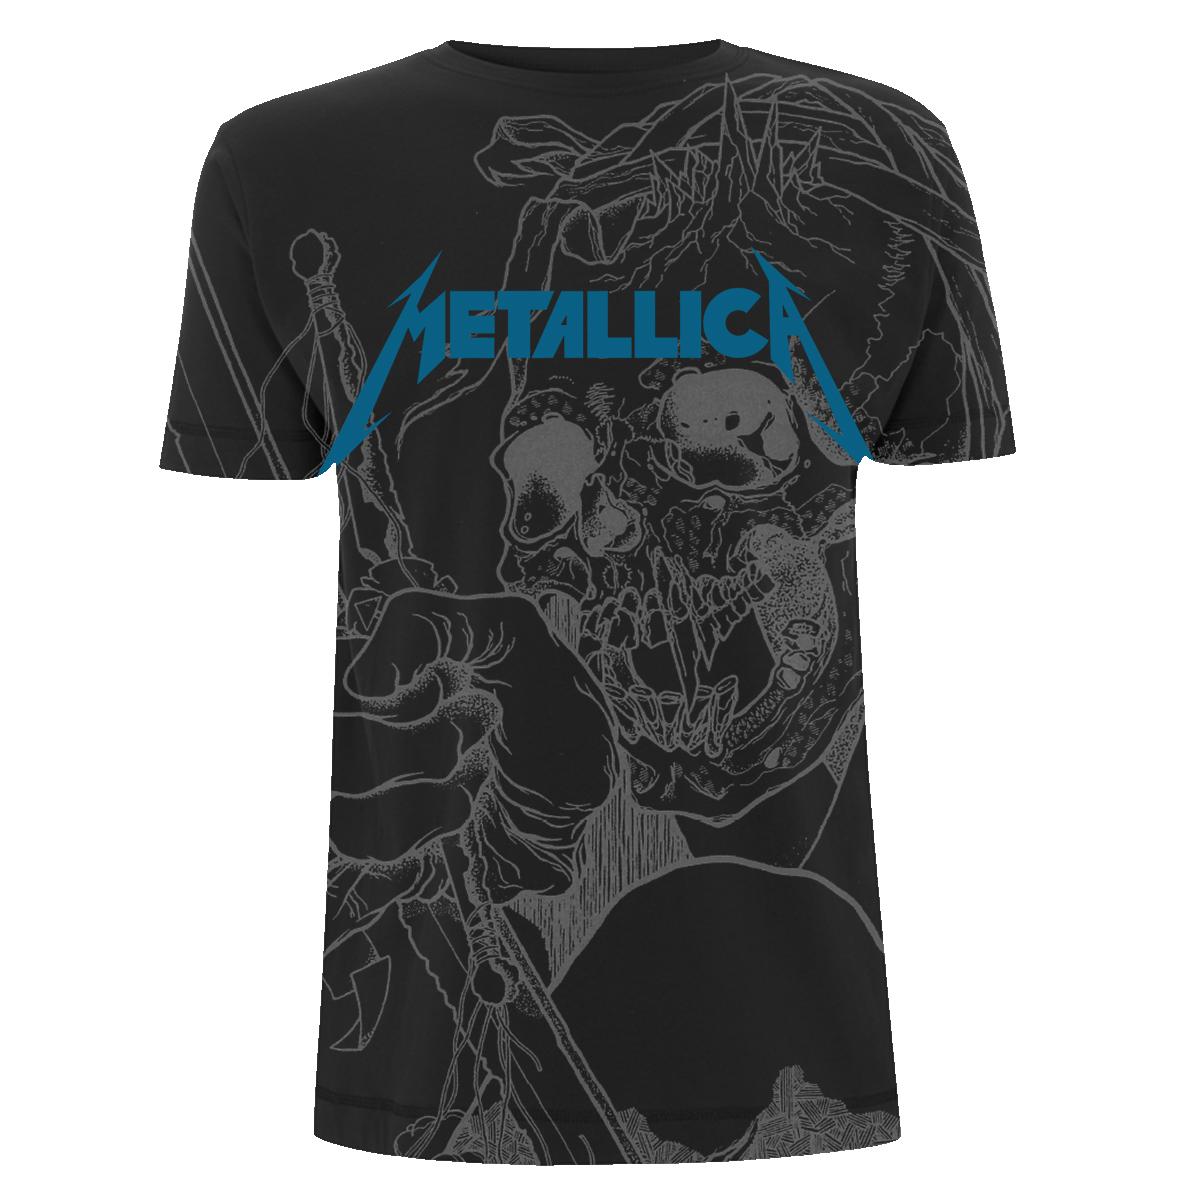 Japanese Justice A/O - Black Tee - Metallica